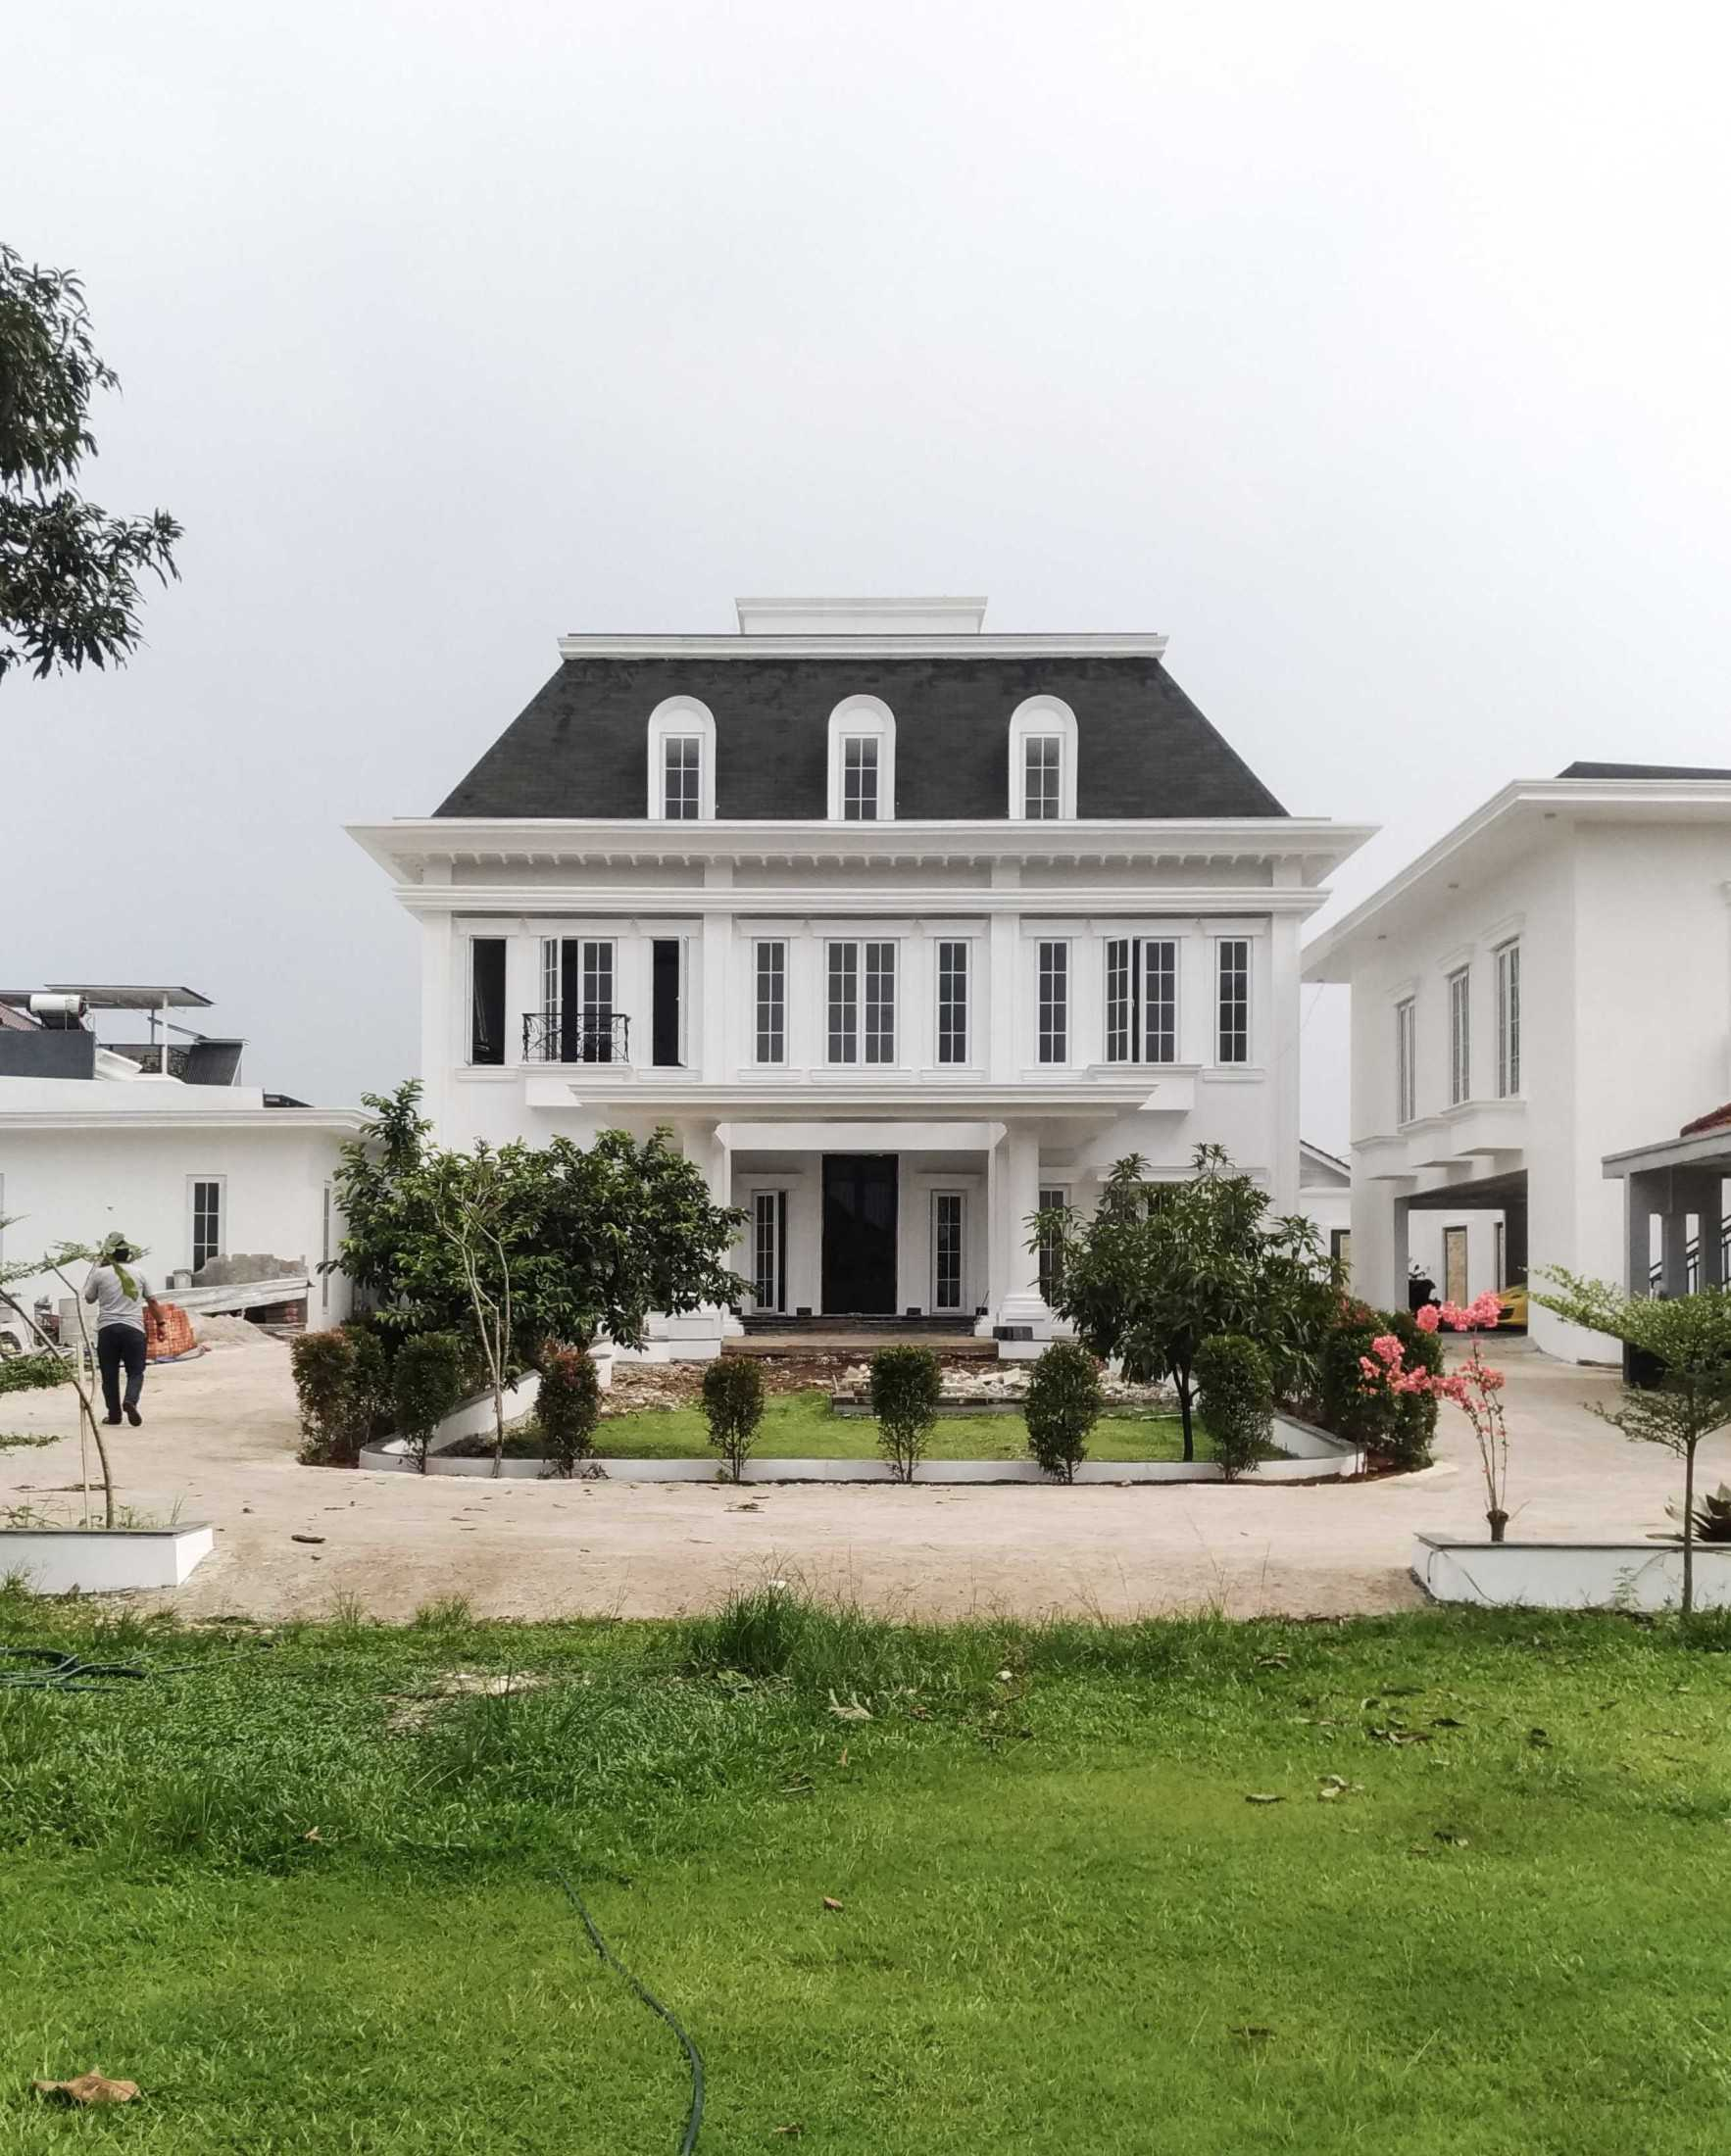 Mahastudio & Partner Hidden Palace House Bogor, Jawa Barat, Indonesia Bogor, Jawa Barat, Indonesia Mahastudio-Partner-Hidden-Palace-House  97214